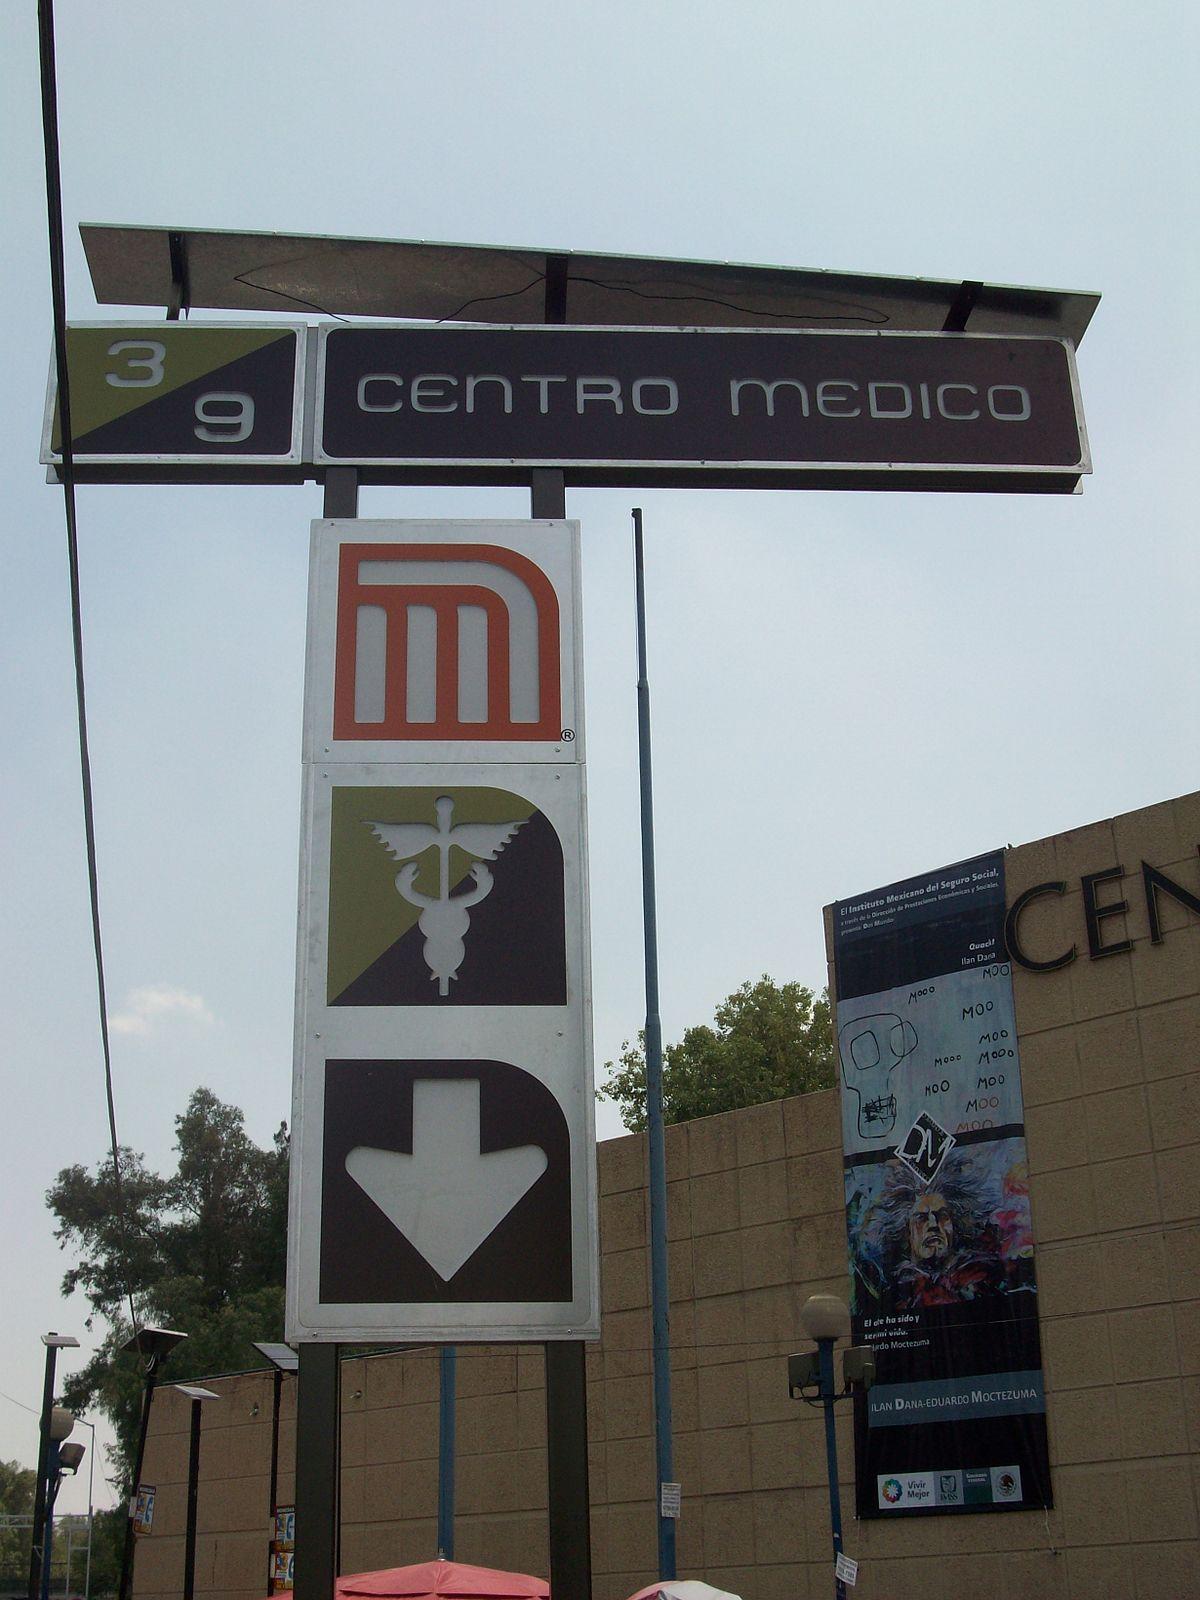 Metro centro m dico wikipedia - Centro deportivo siglo xxi zaragoza ...